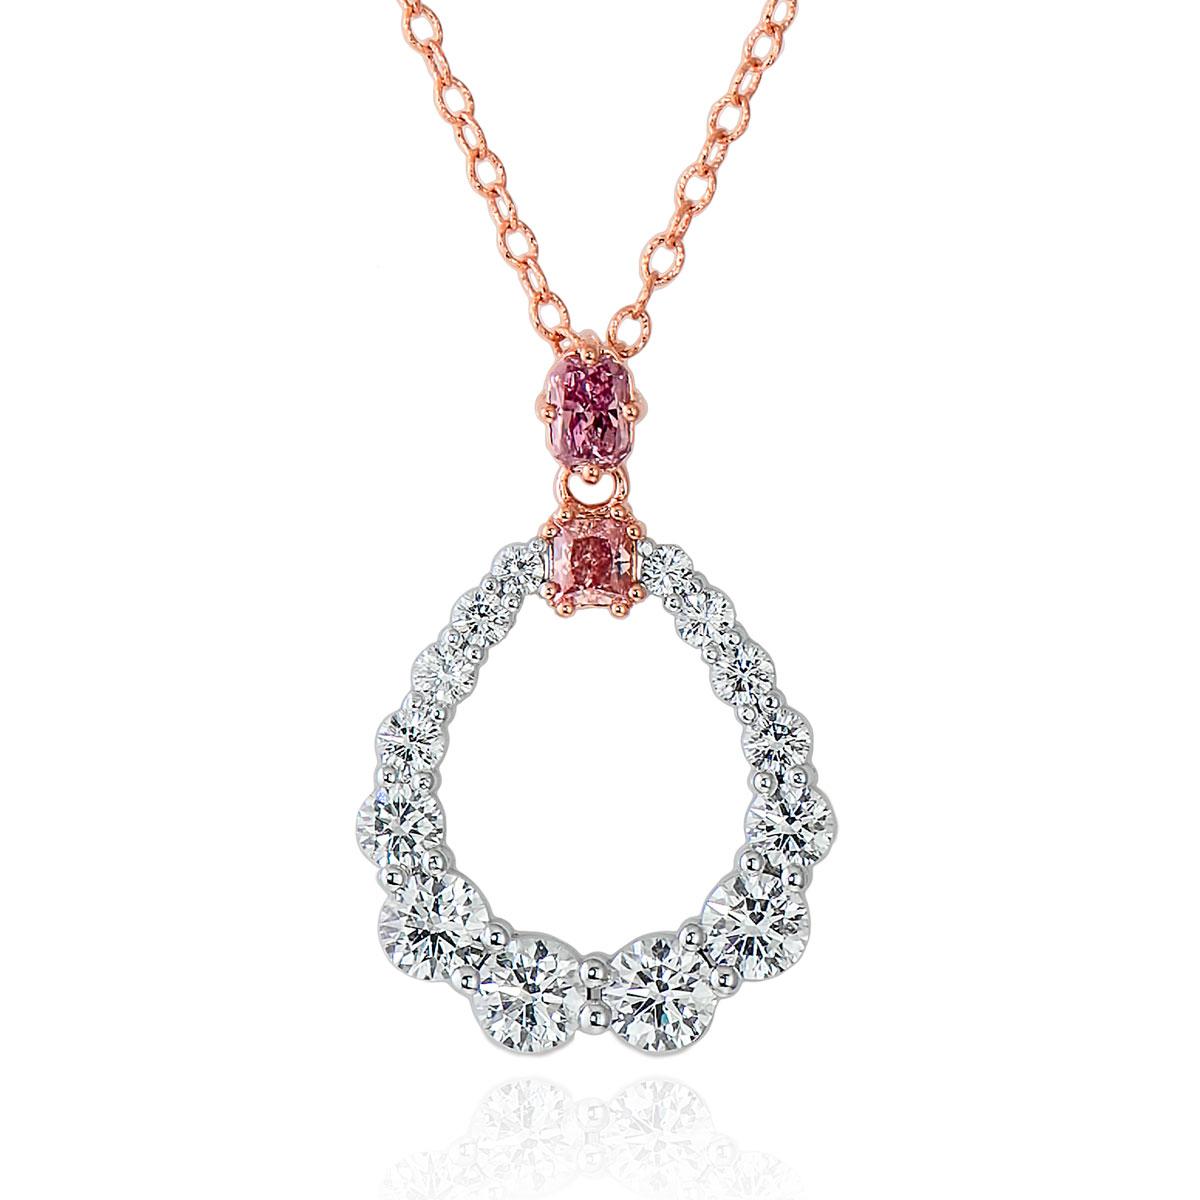 0.44ct (Argyle) Fancy Intense Purplish Pink & 0.35ct (Argyle) Fancy Intense Pink Diamond Pendant (4.15ct TW)